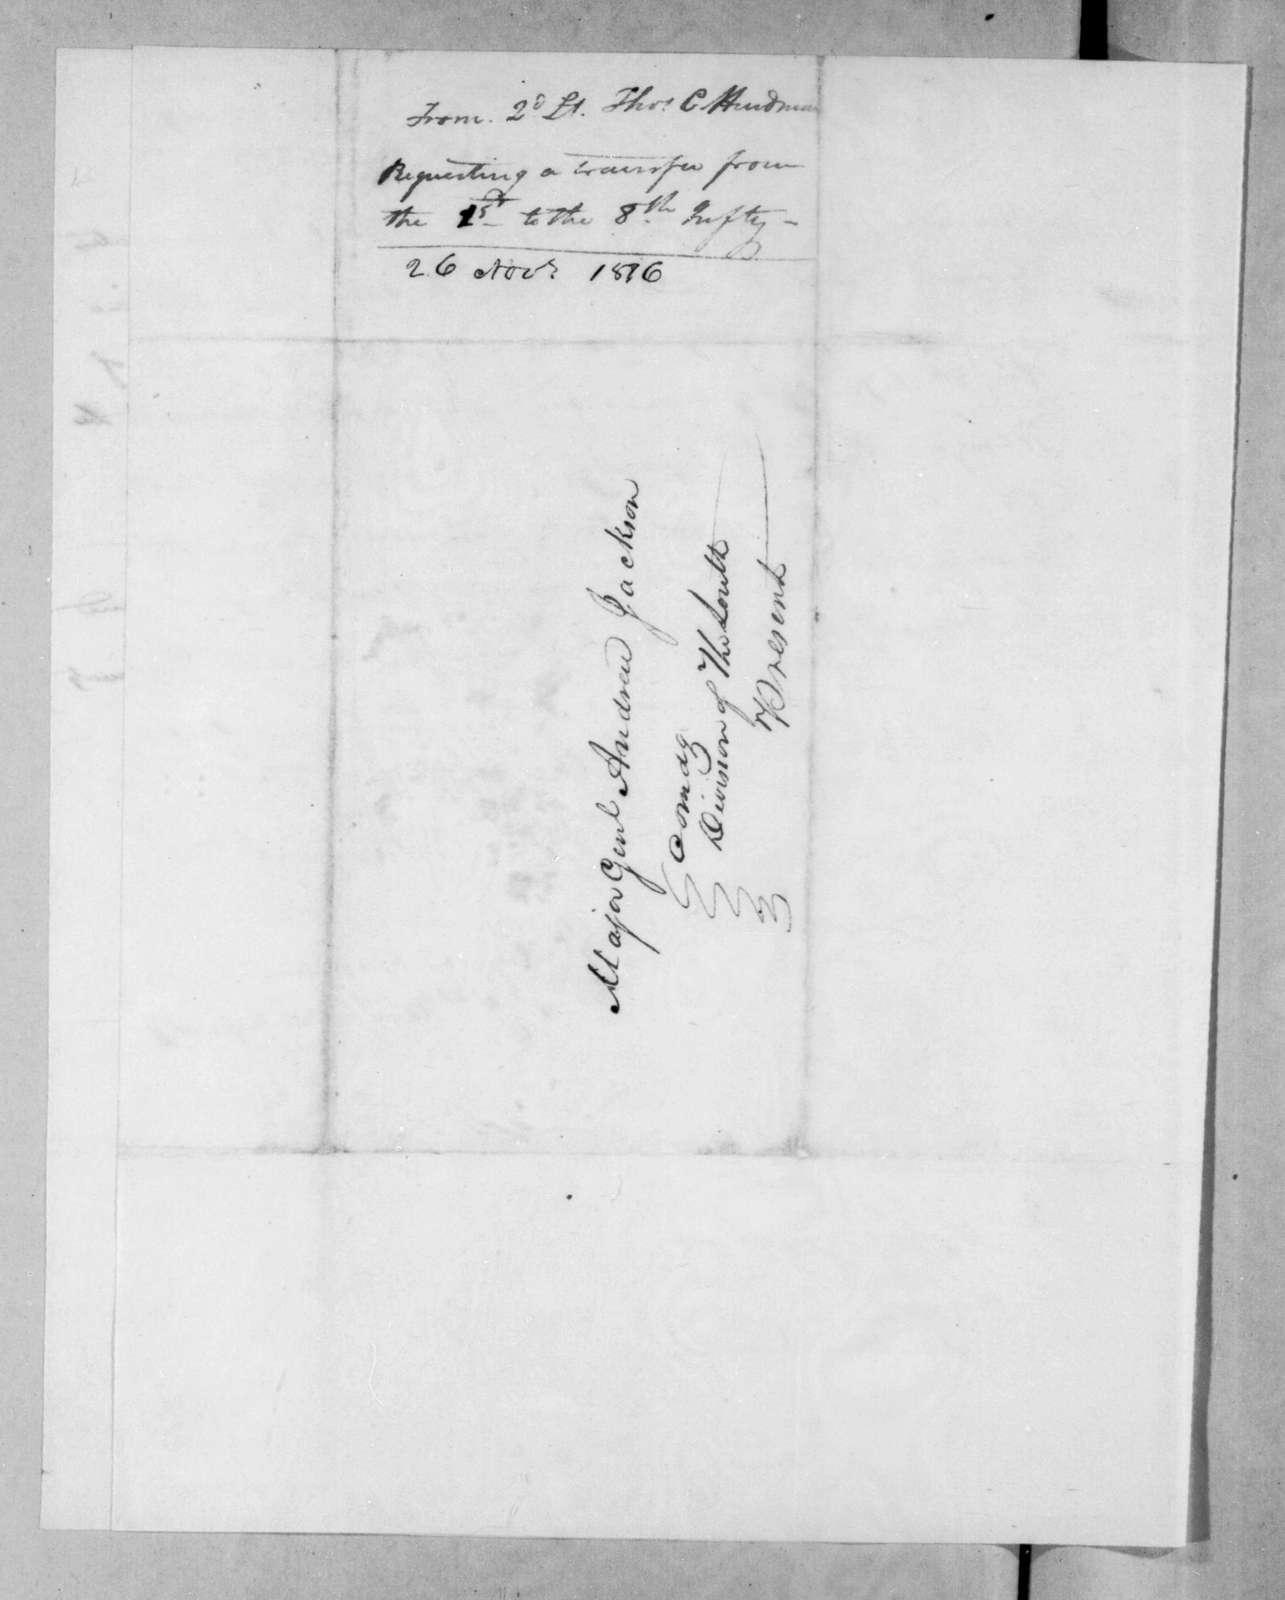 Thomas Carmichael Hindman to Andrew Jackson, March 26, 1816